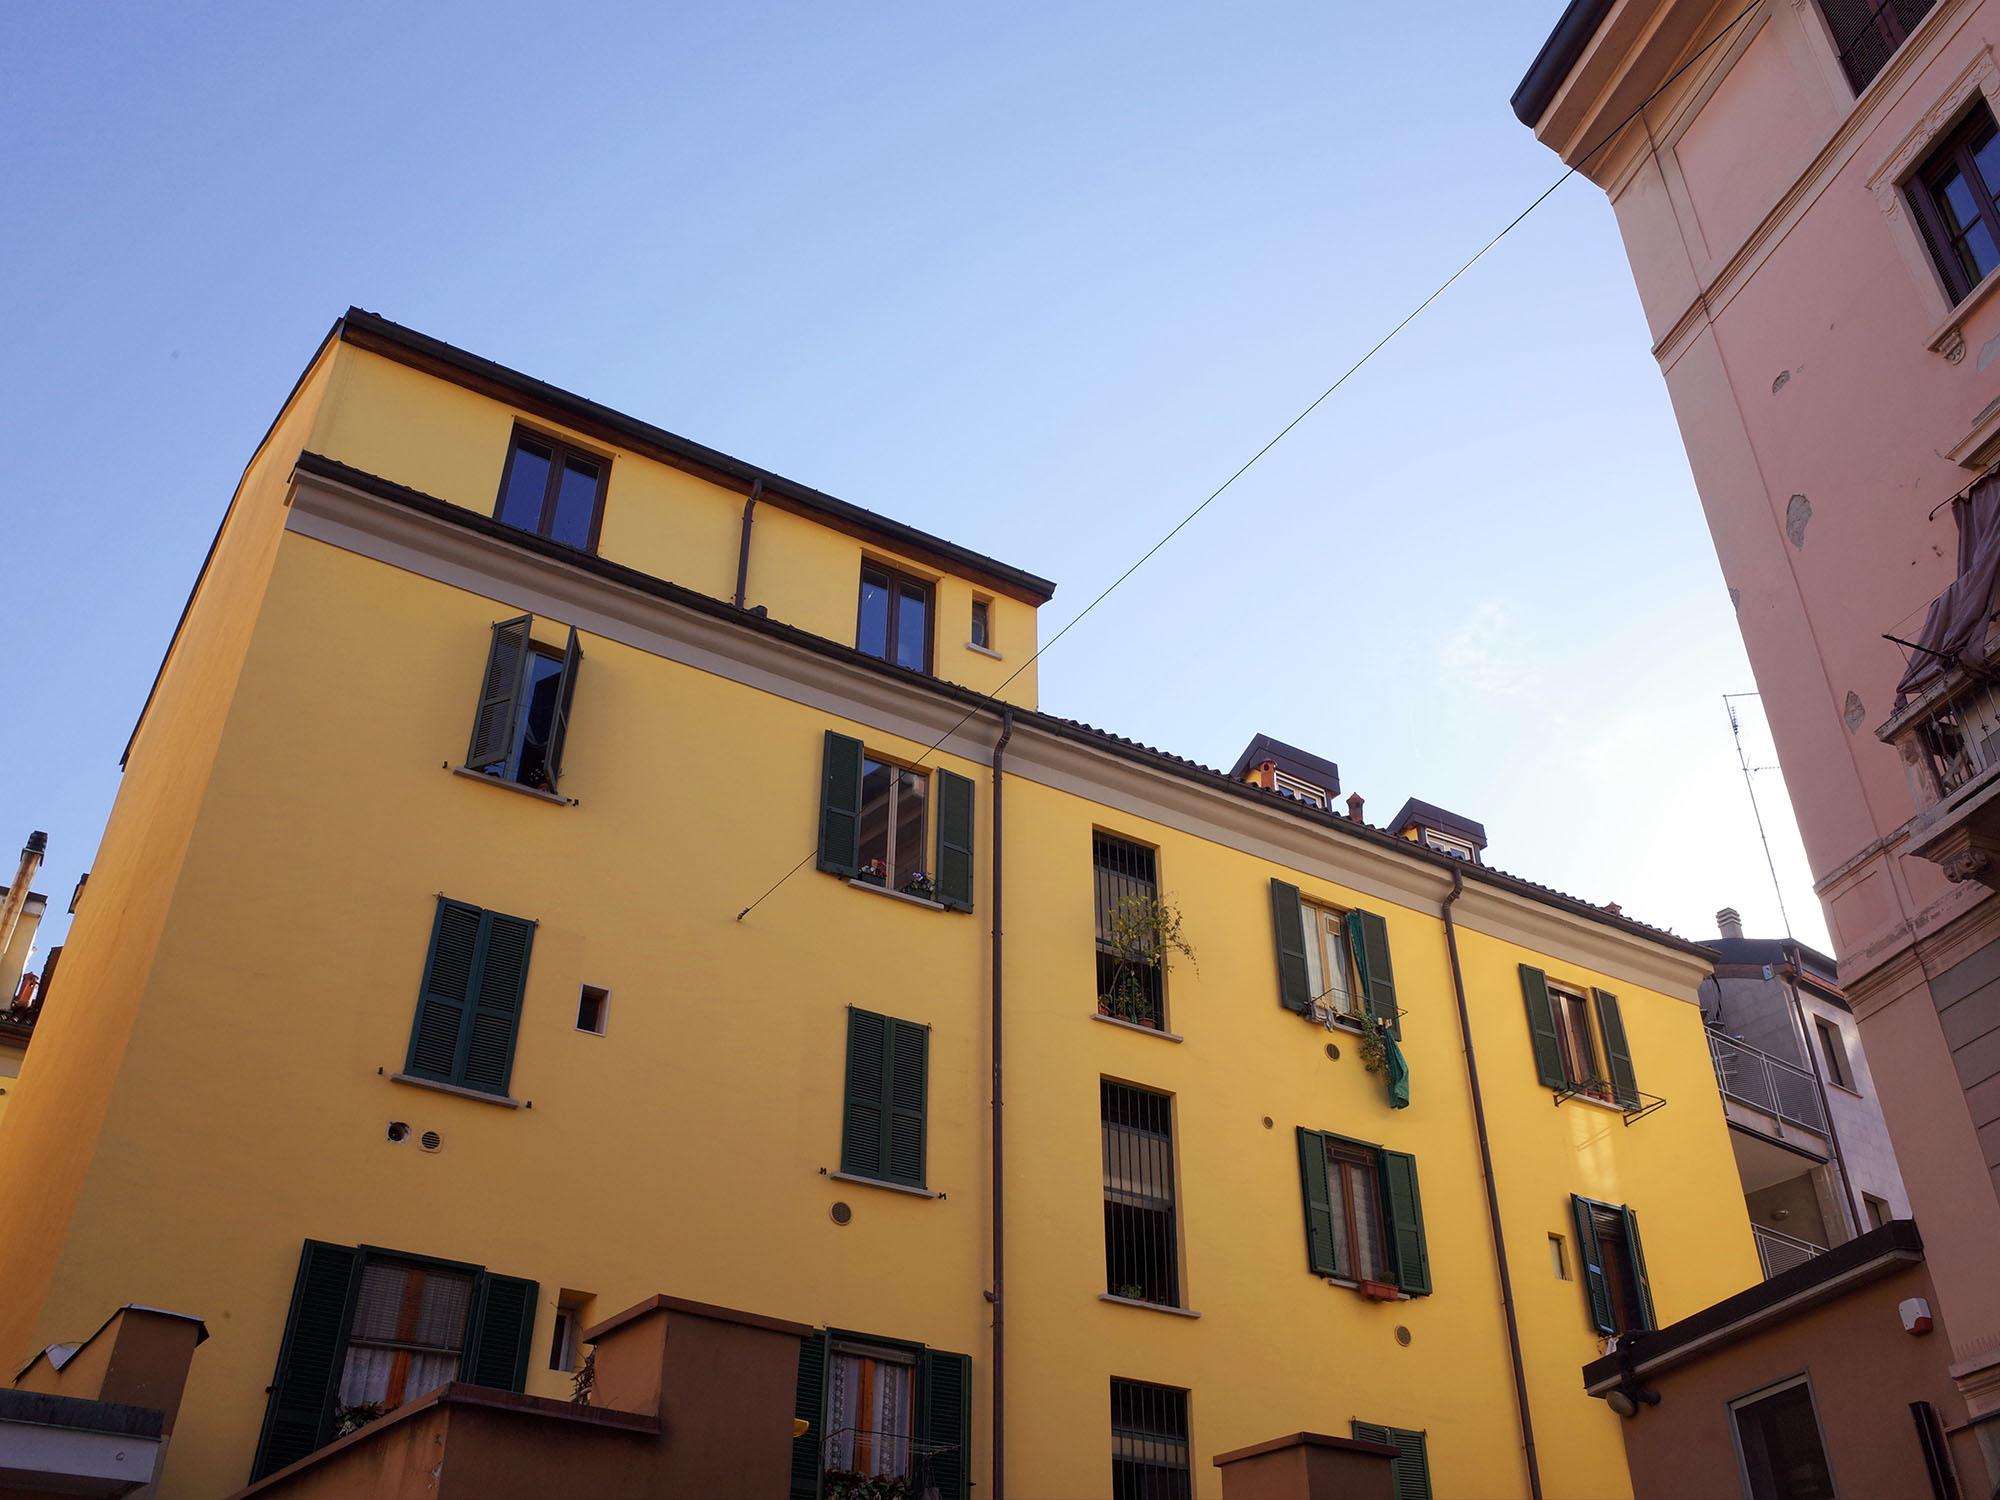 milan maison jaune 2015